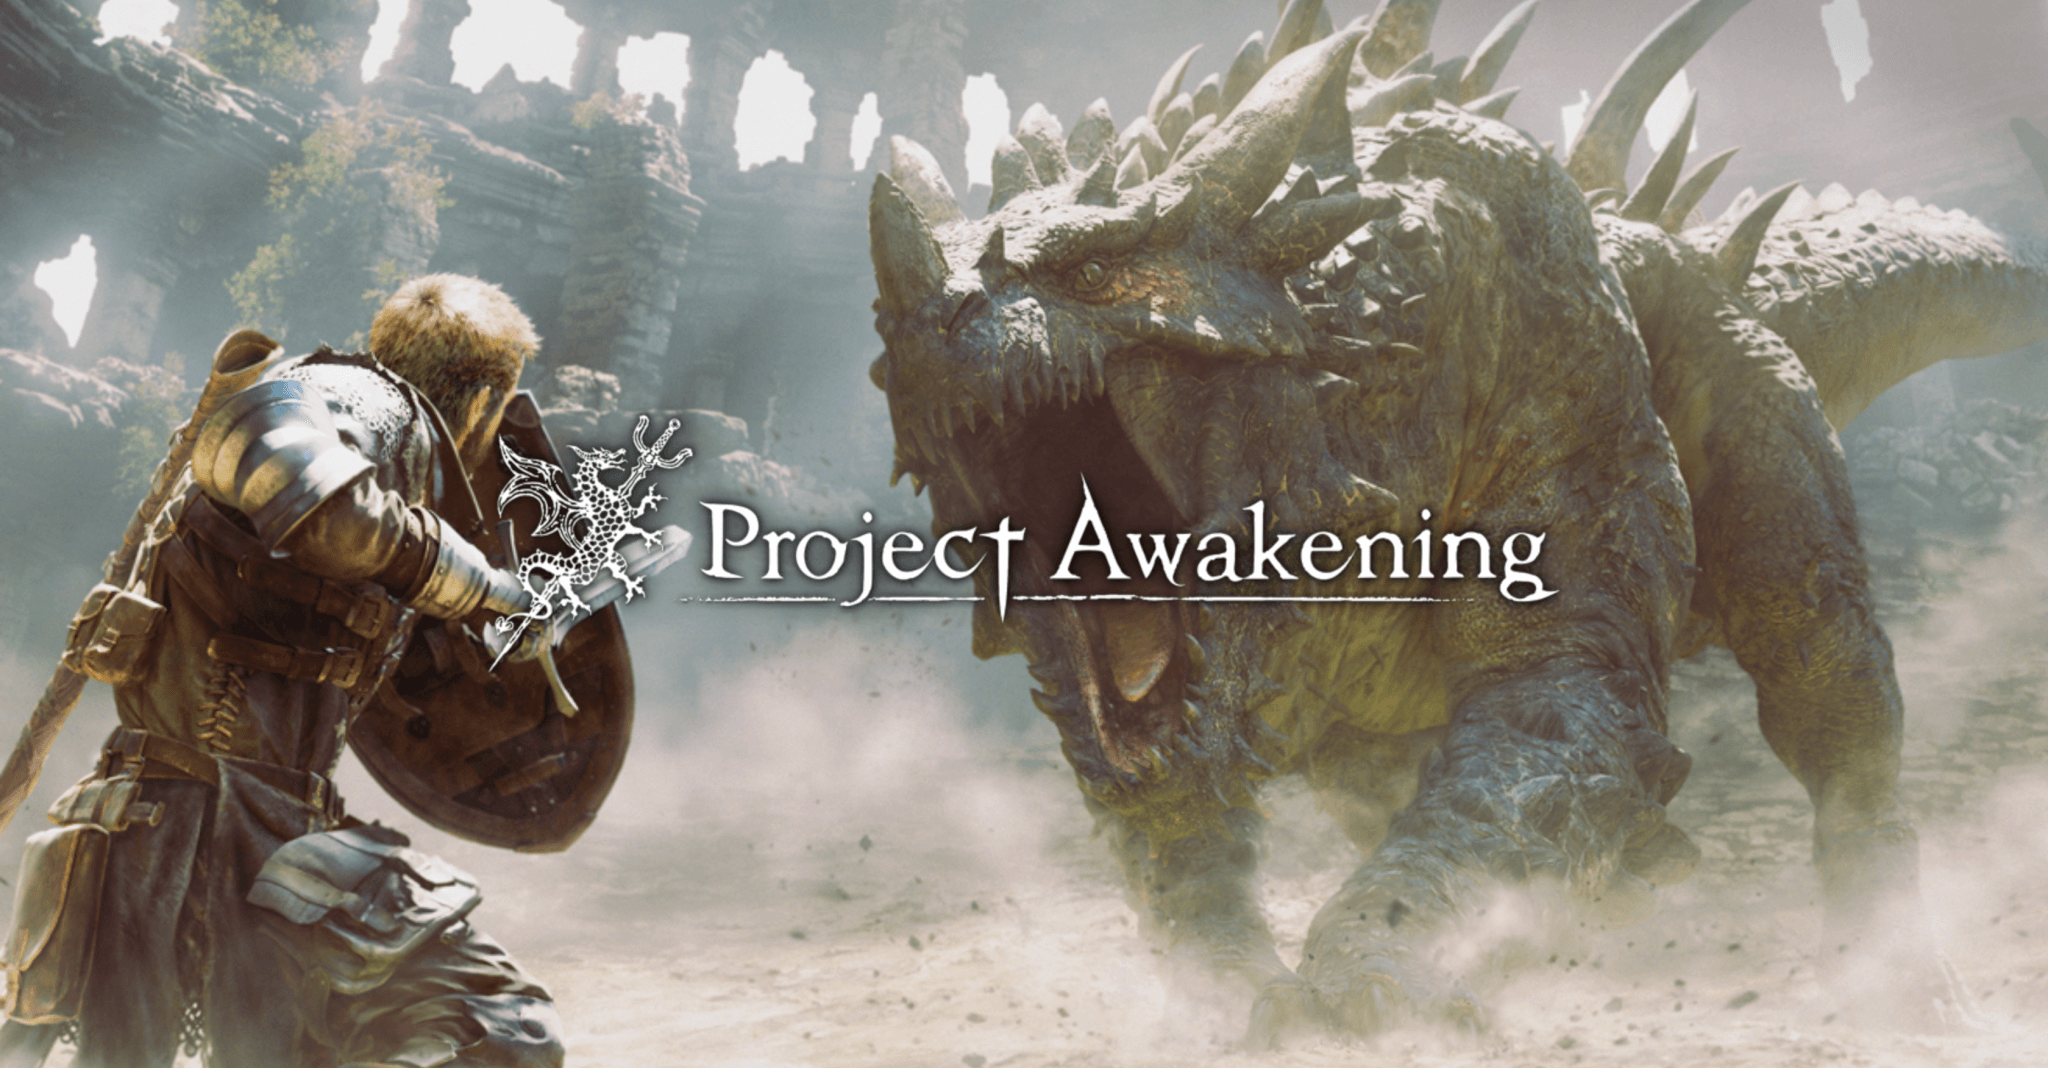 「Project Awakening」の発売日はいつ?予約特典と最新情報